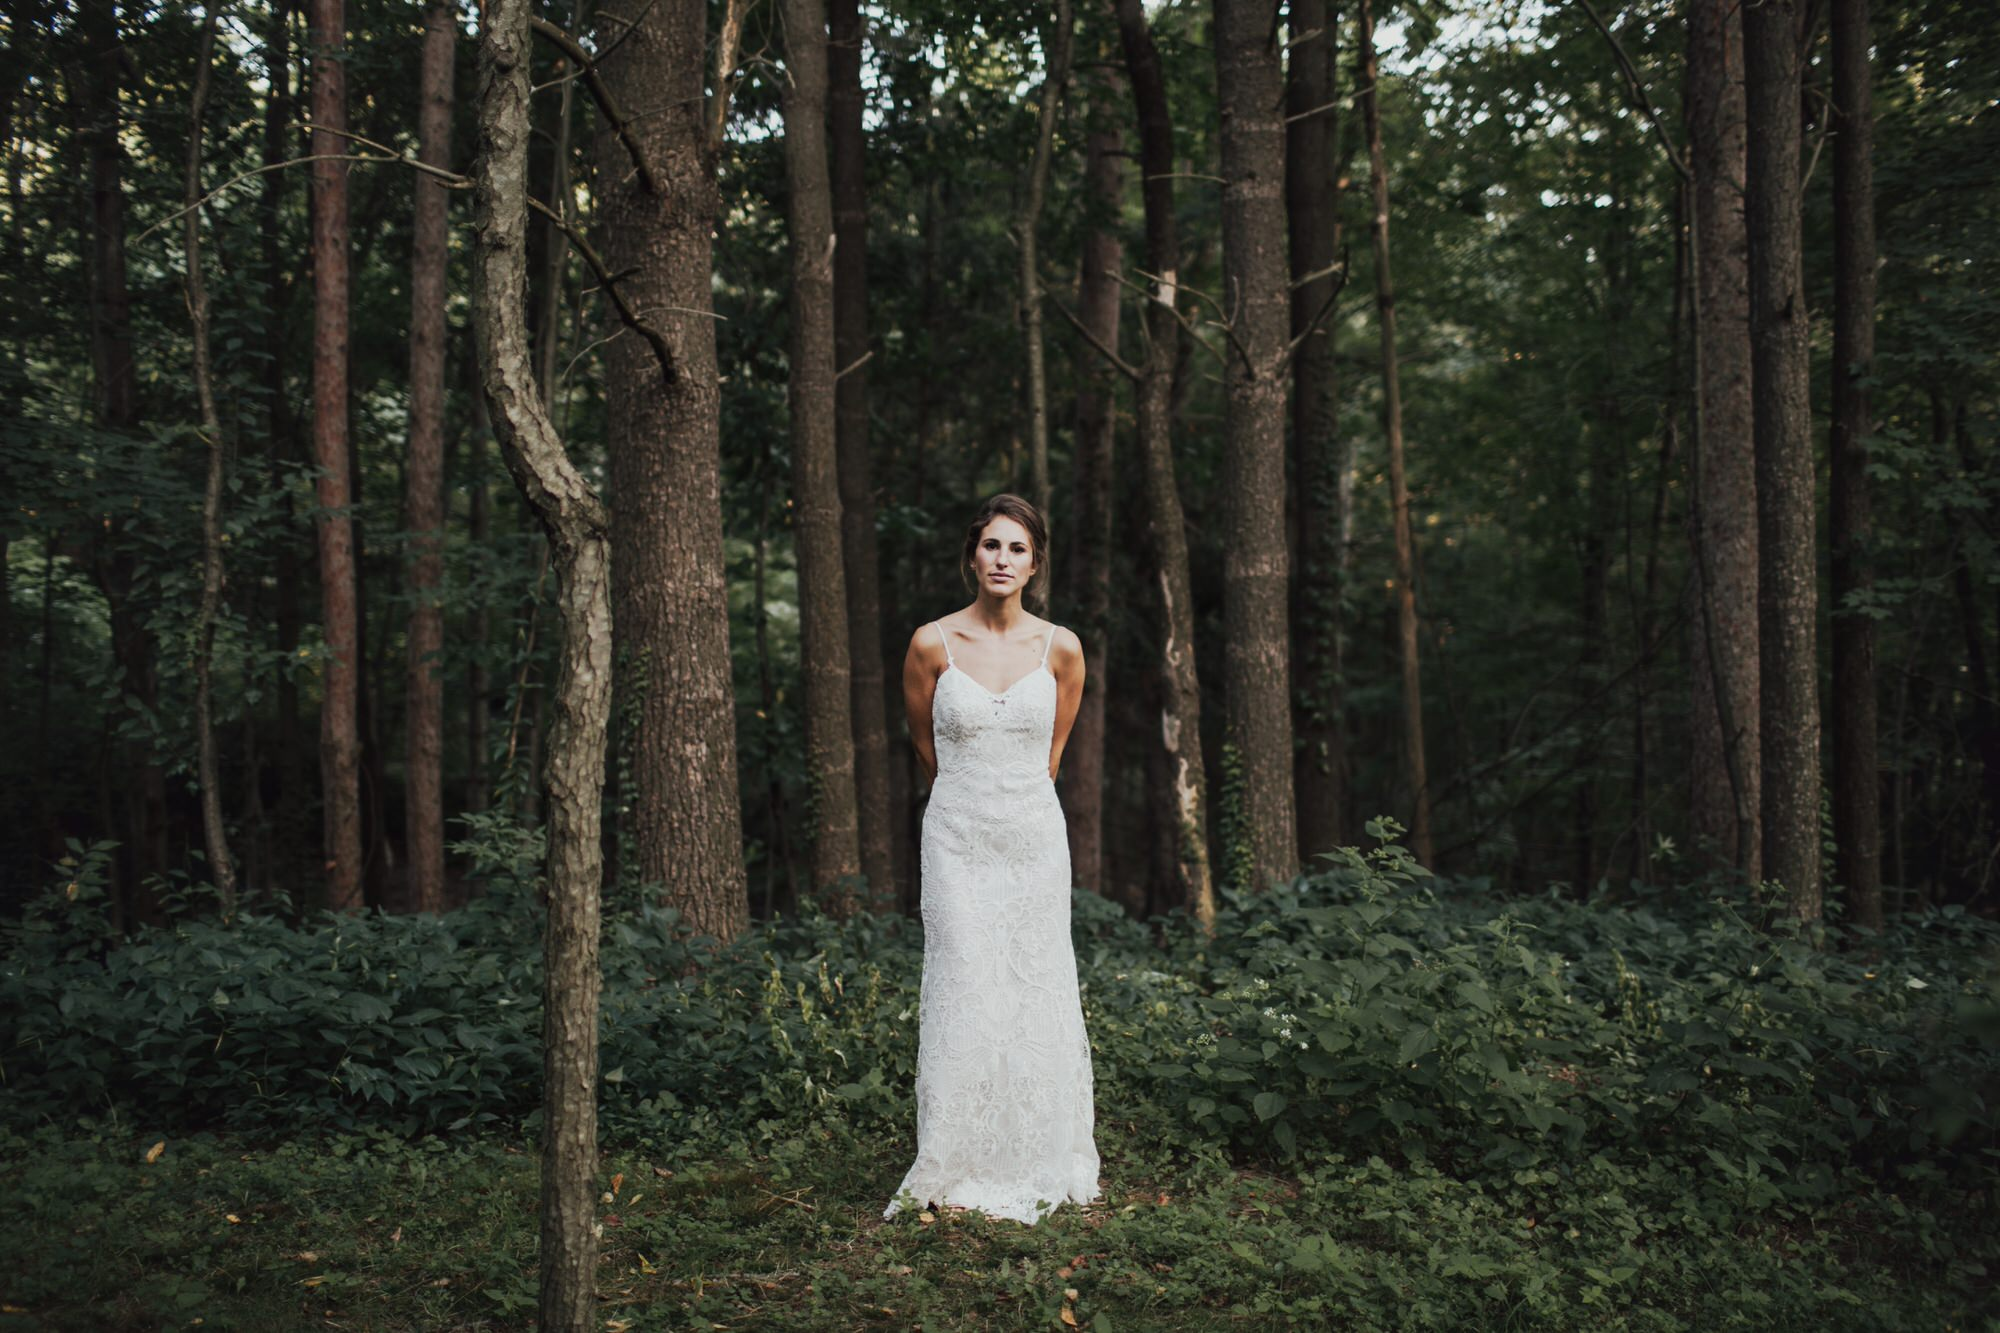 emily-aaron-rochester-new-york-wedding-photographer-105.JPG